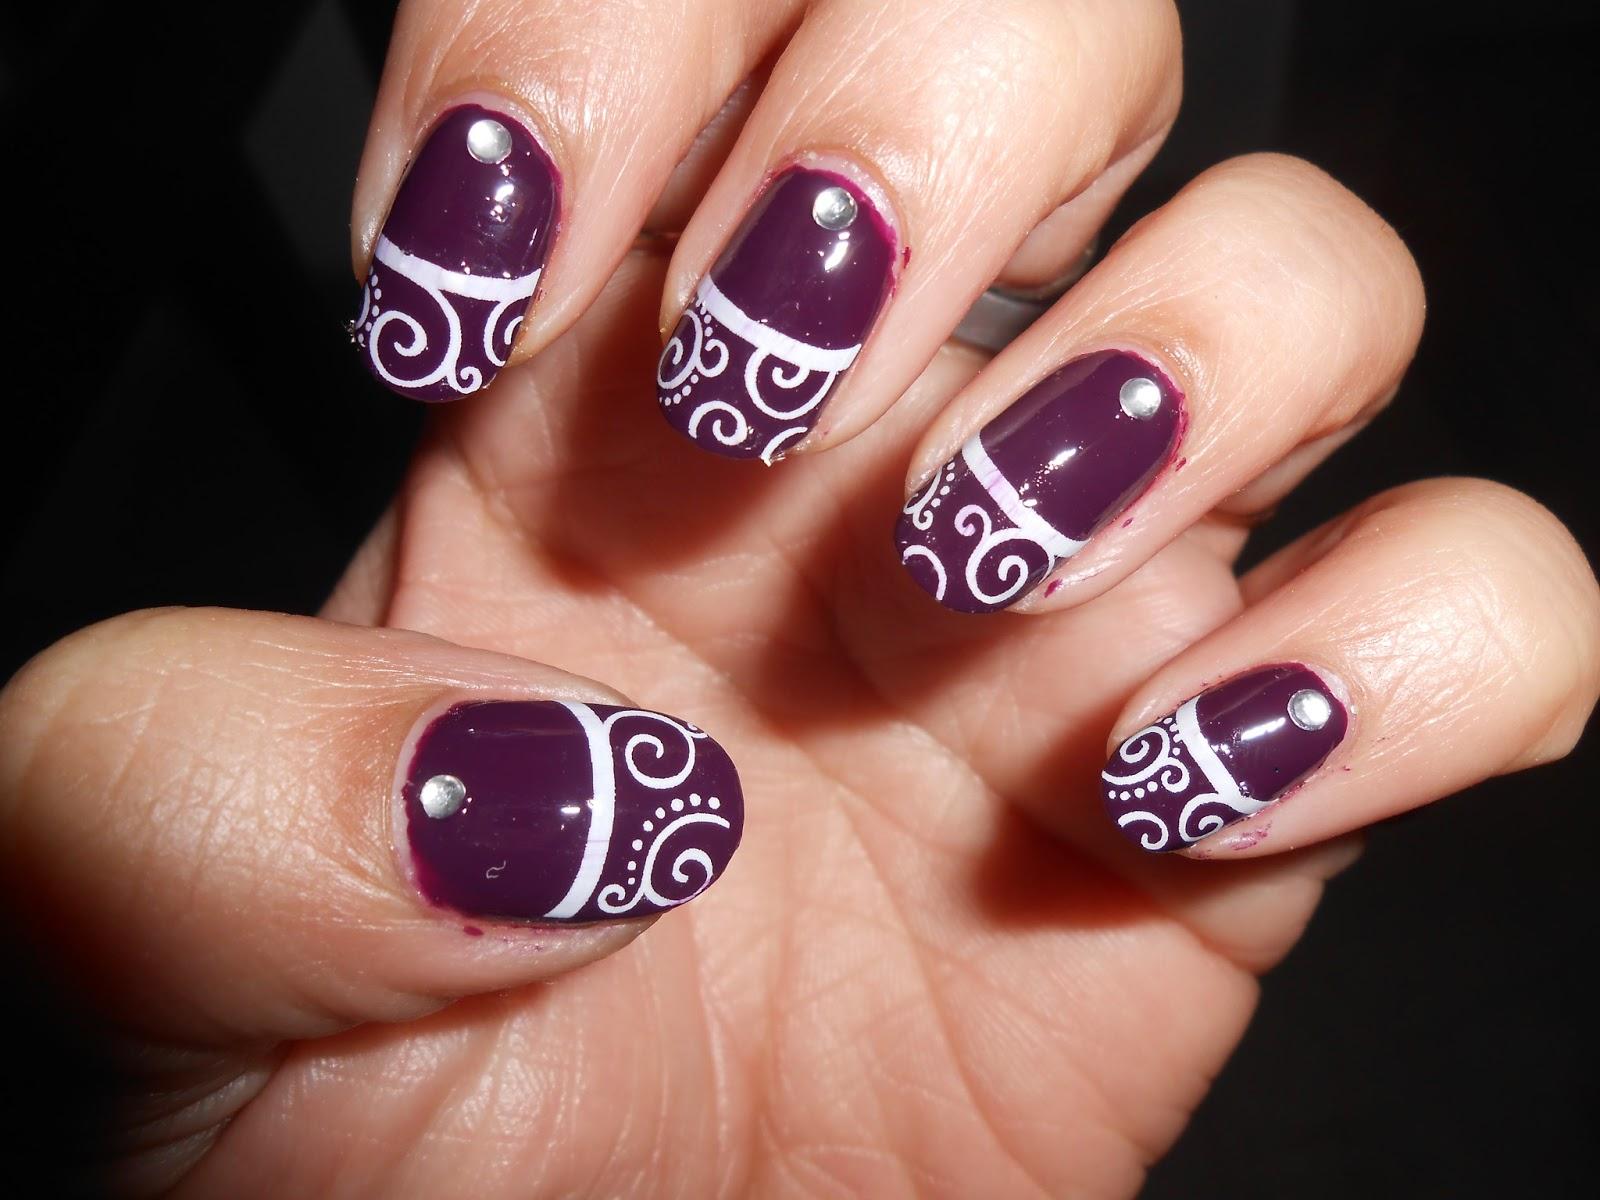 Cute nails: beautiful swirl nails : 2 designs.